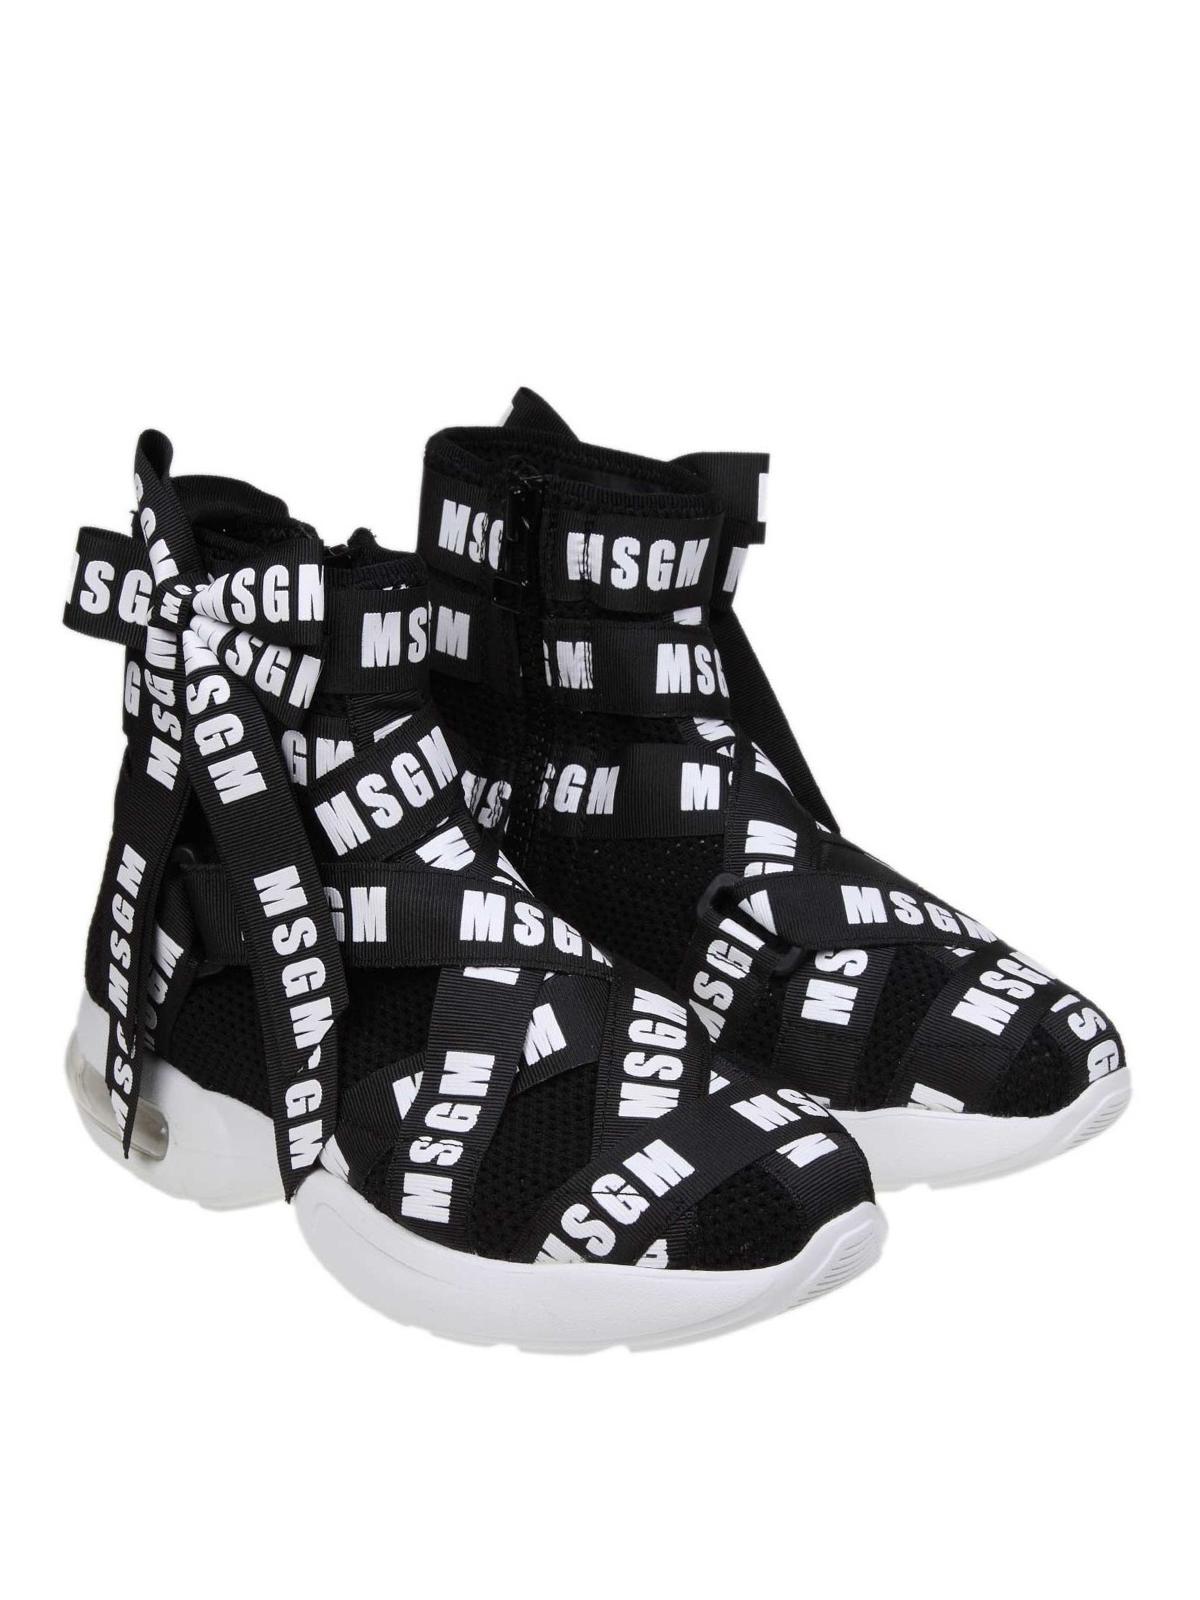 mSneaker M Schwarz 129 s g 2641mds1901 wk8n0POX